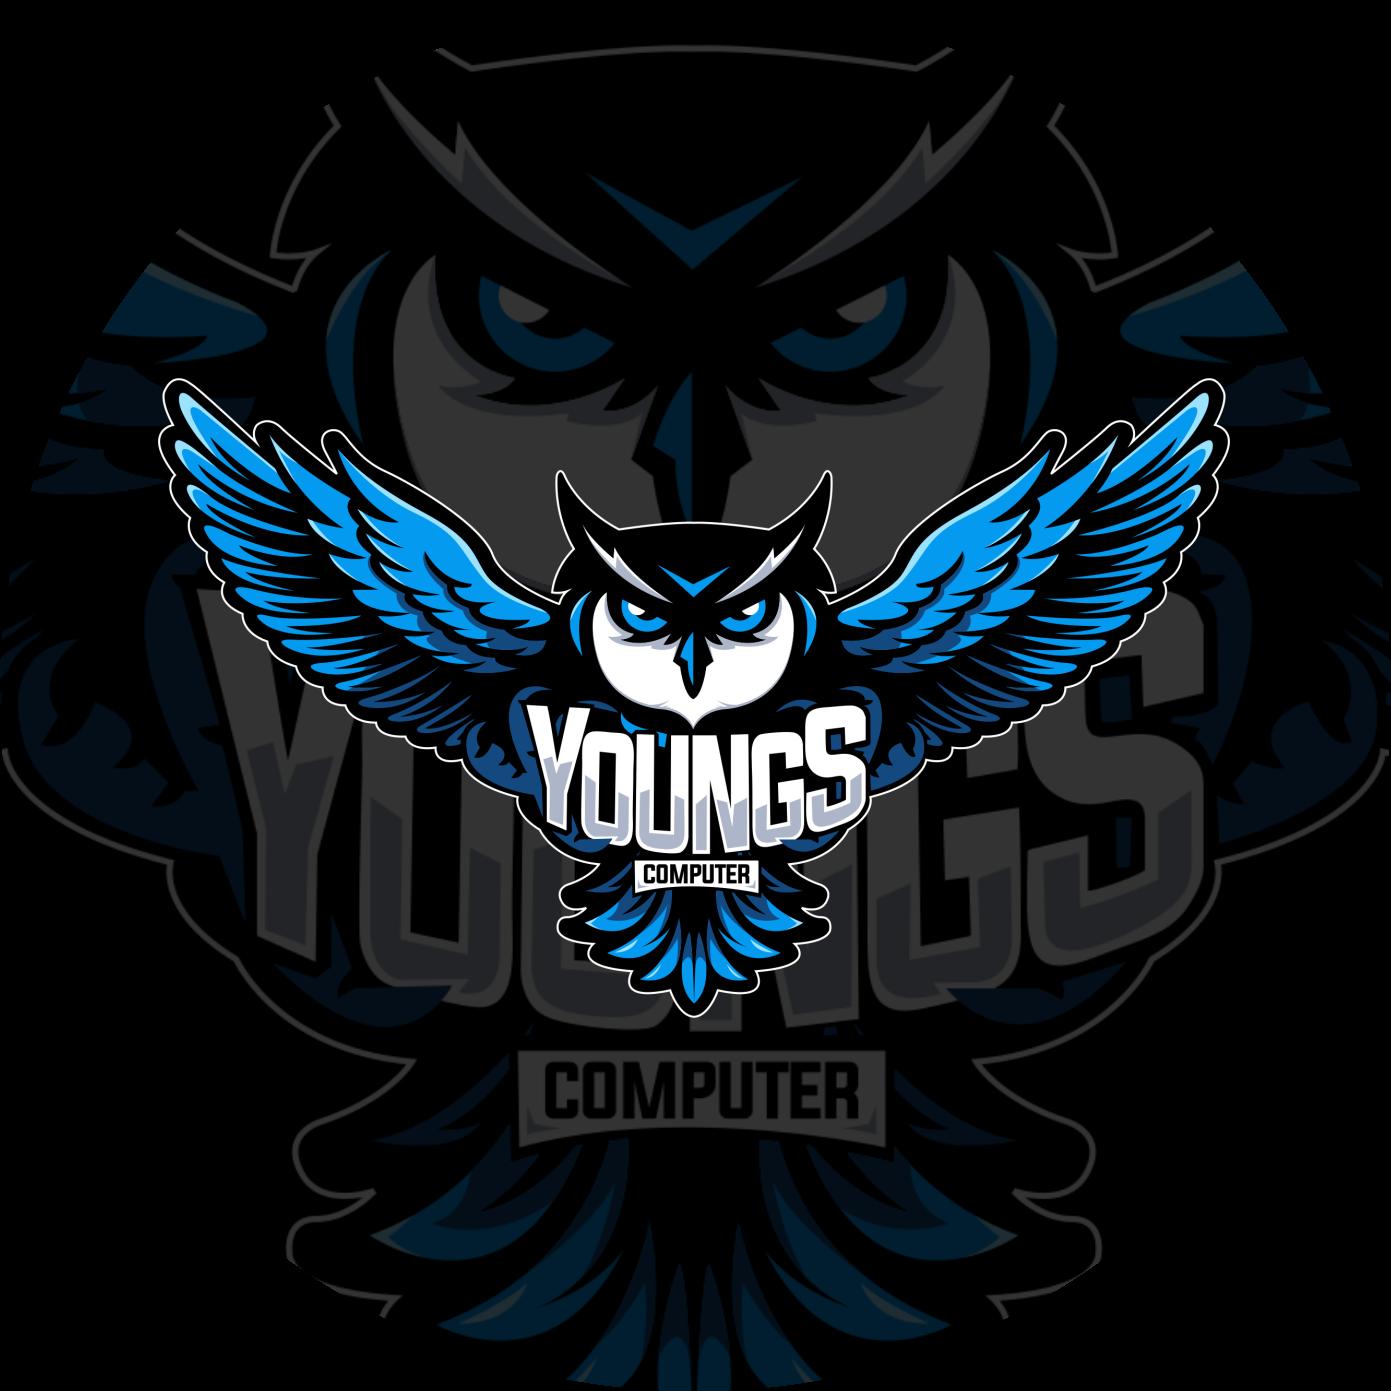 @youngscom Profile Image | Linktree